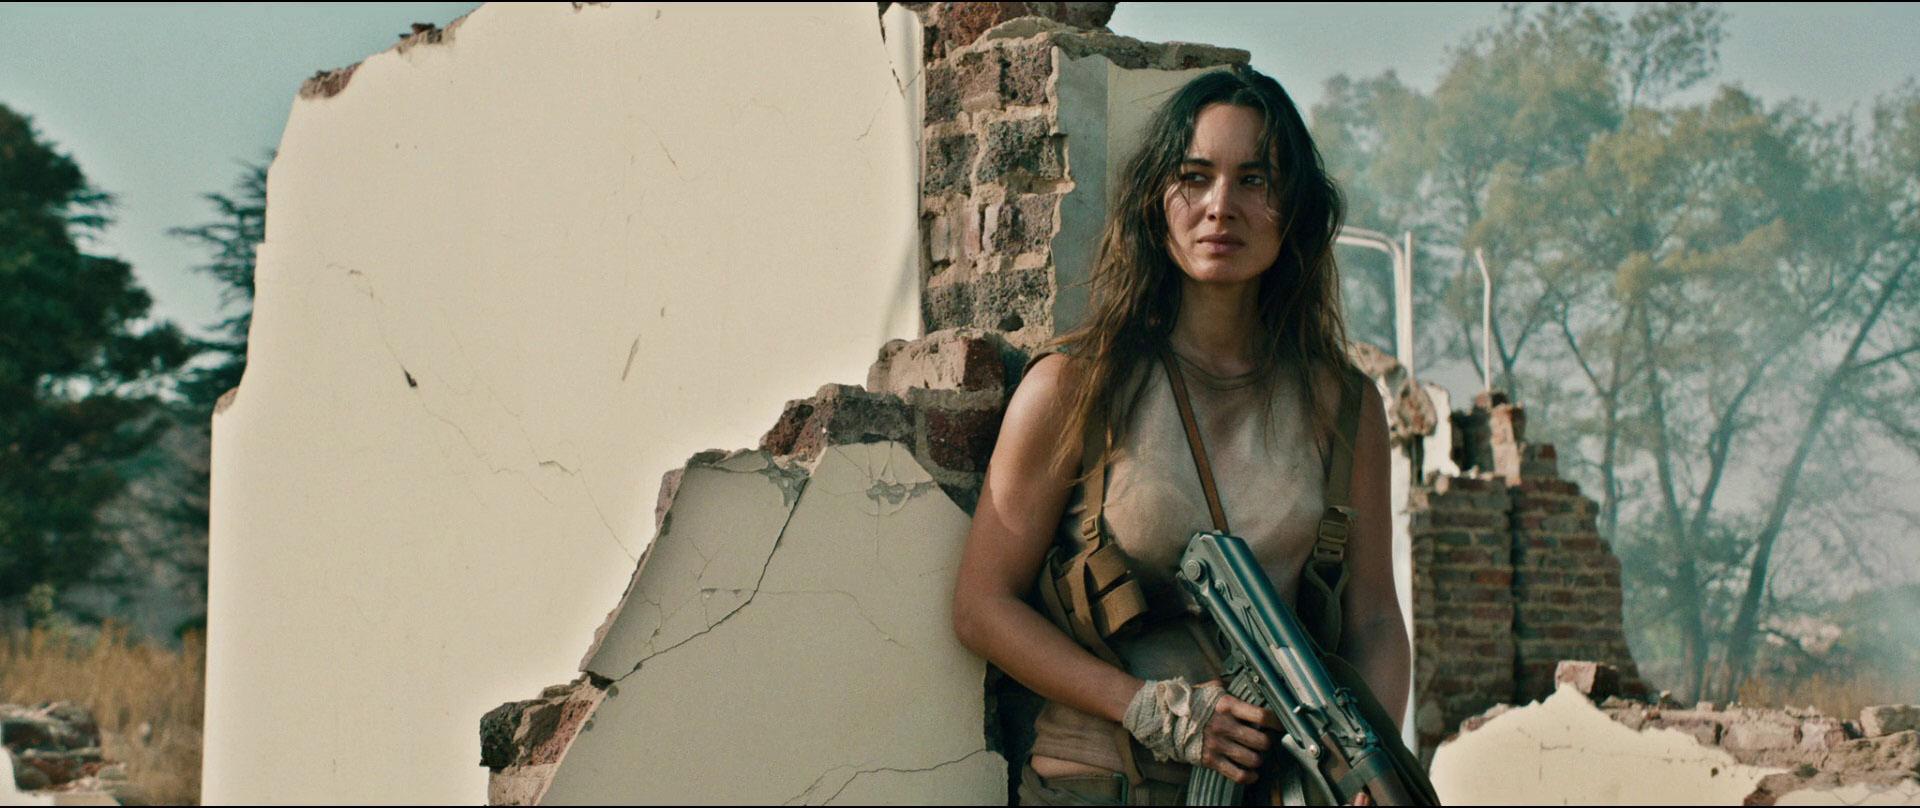 İsyan | Revolt | 2017 | BDRip | XviD | Türkçe Dublaj | m720p - m1080p | BluRay | Dual | TR-EN | Tek Link